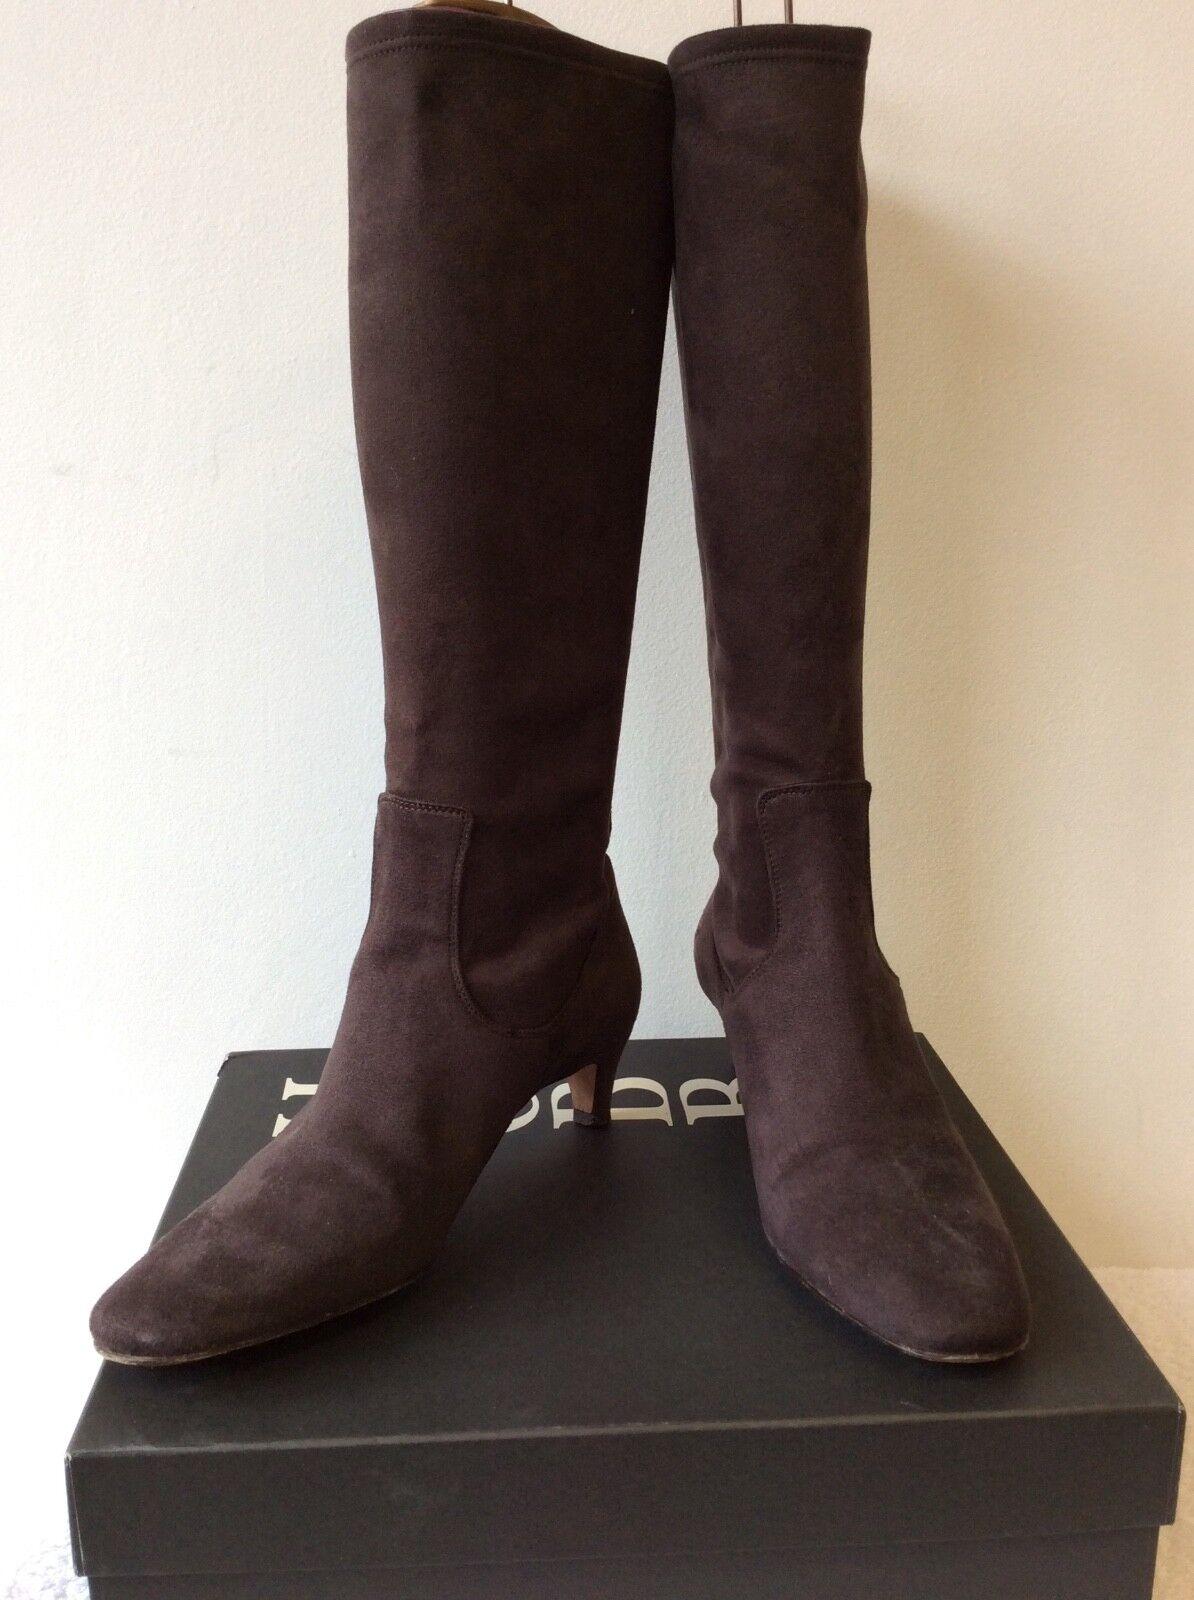 Hobbs Cherie Marrón Chocolate Elástico botas Talla 5 5 5 38  marca famosa